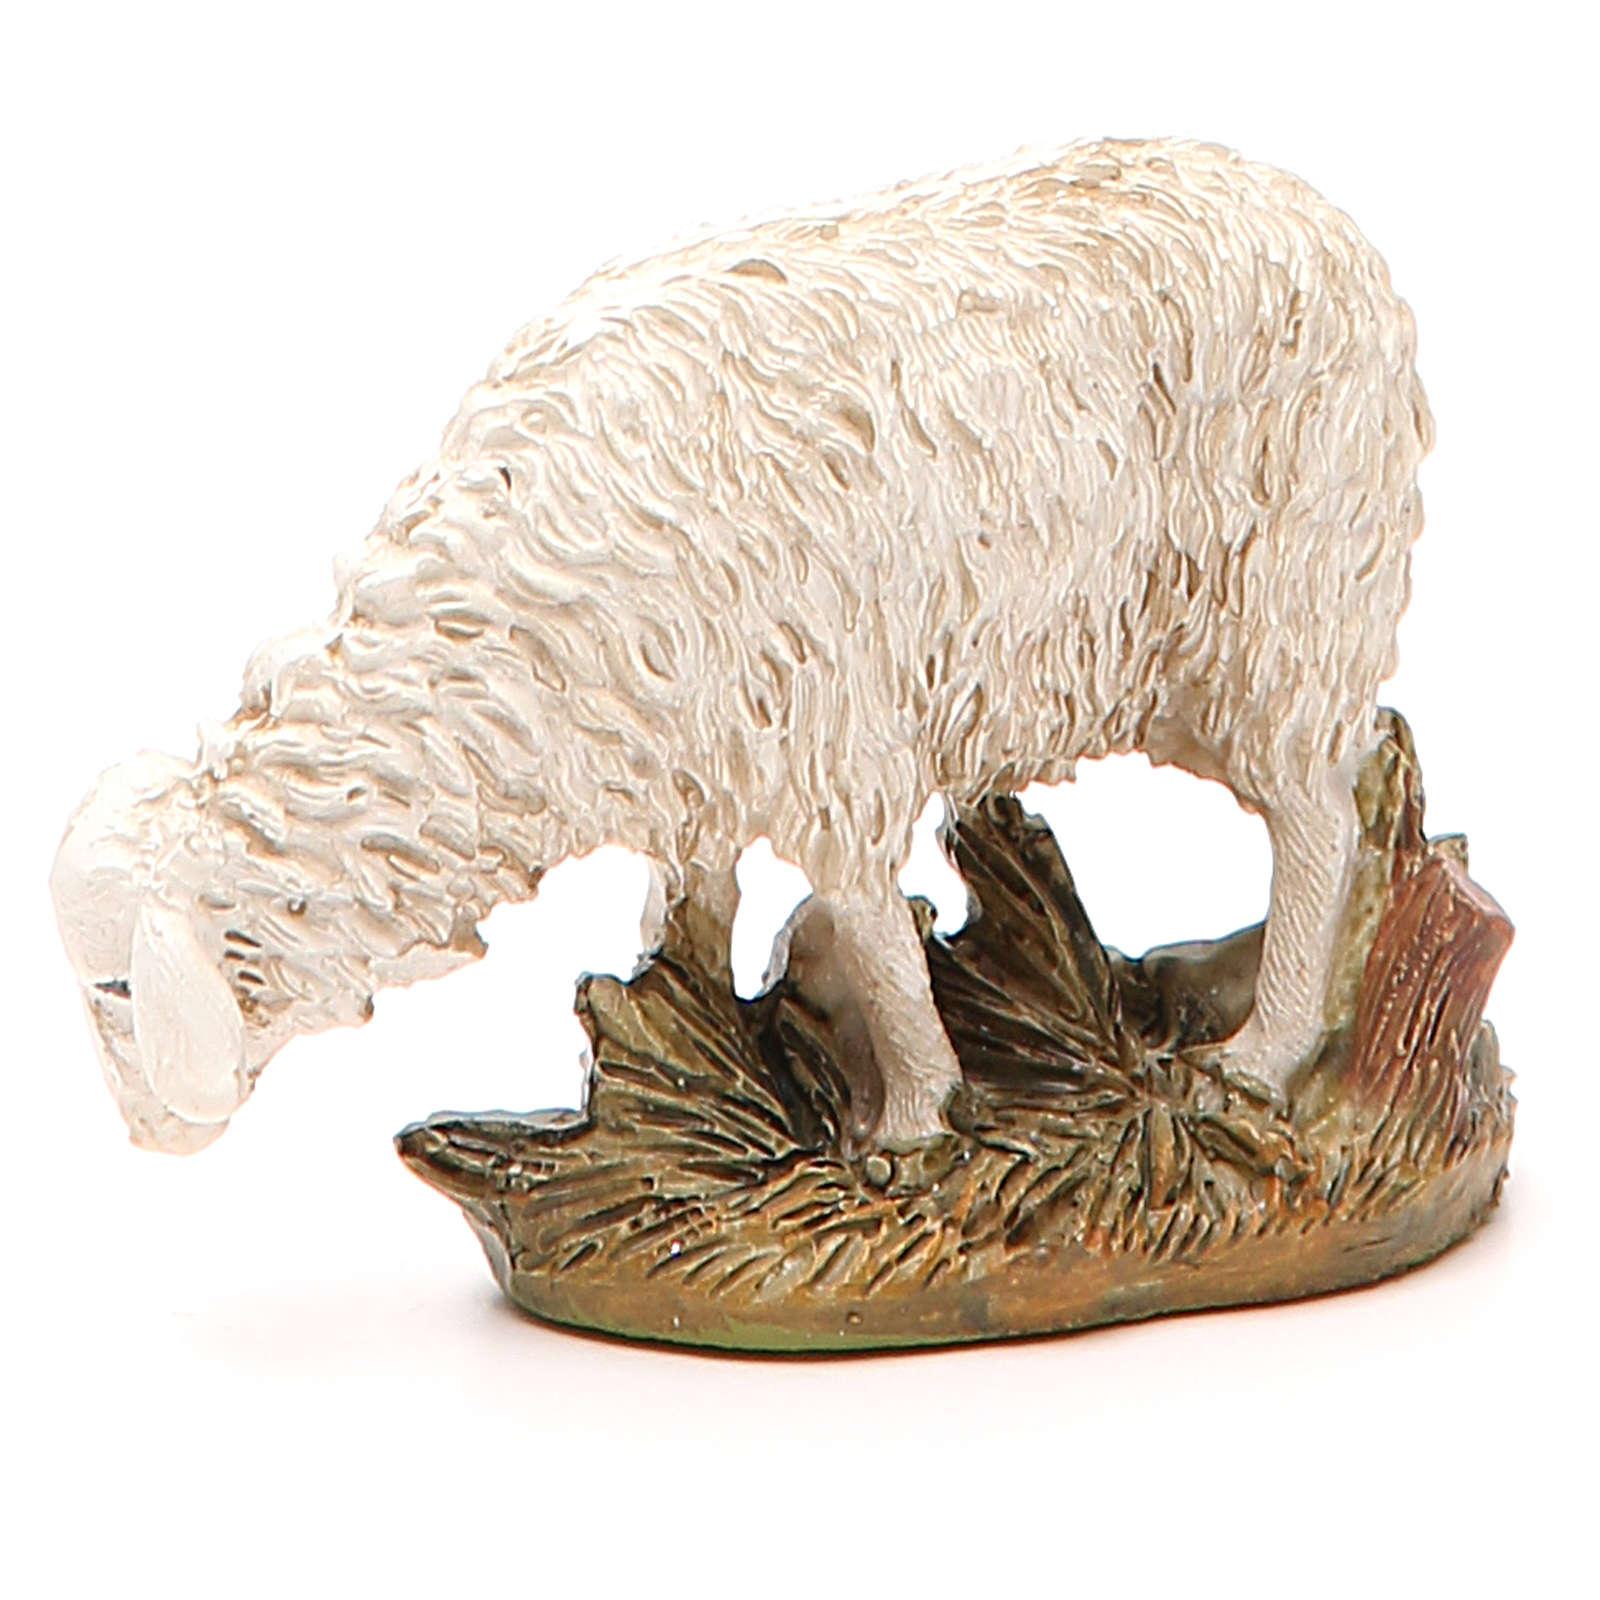 Sheep looking down in painted resin, 12cm Martino Landi Nativity 3